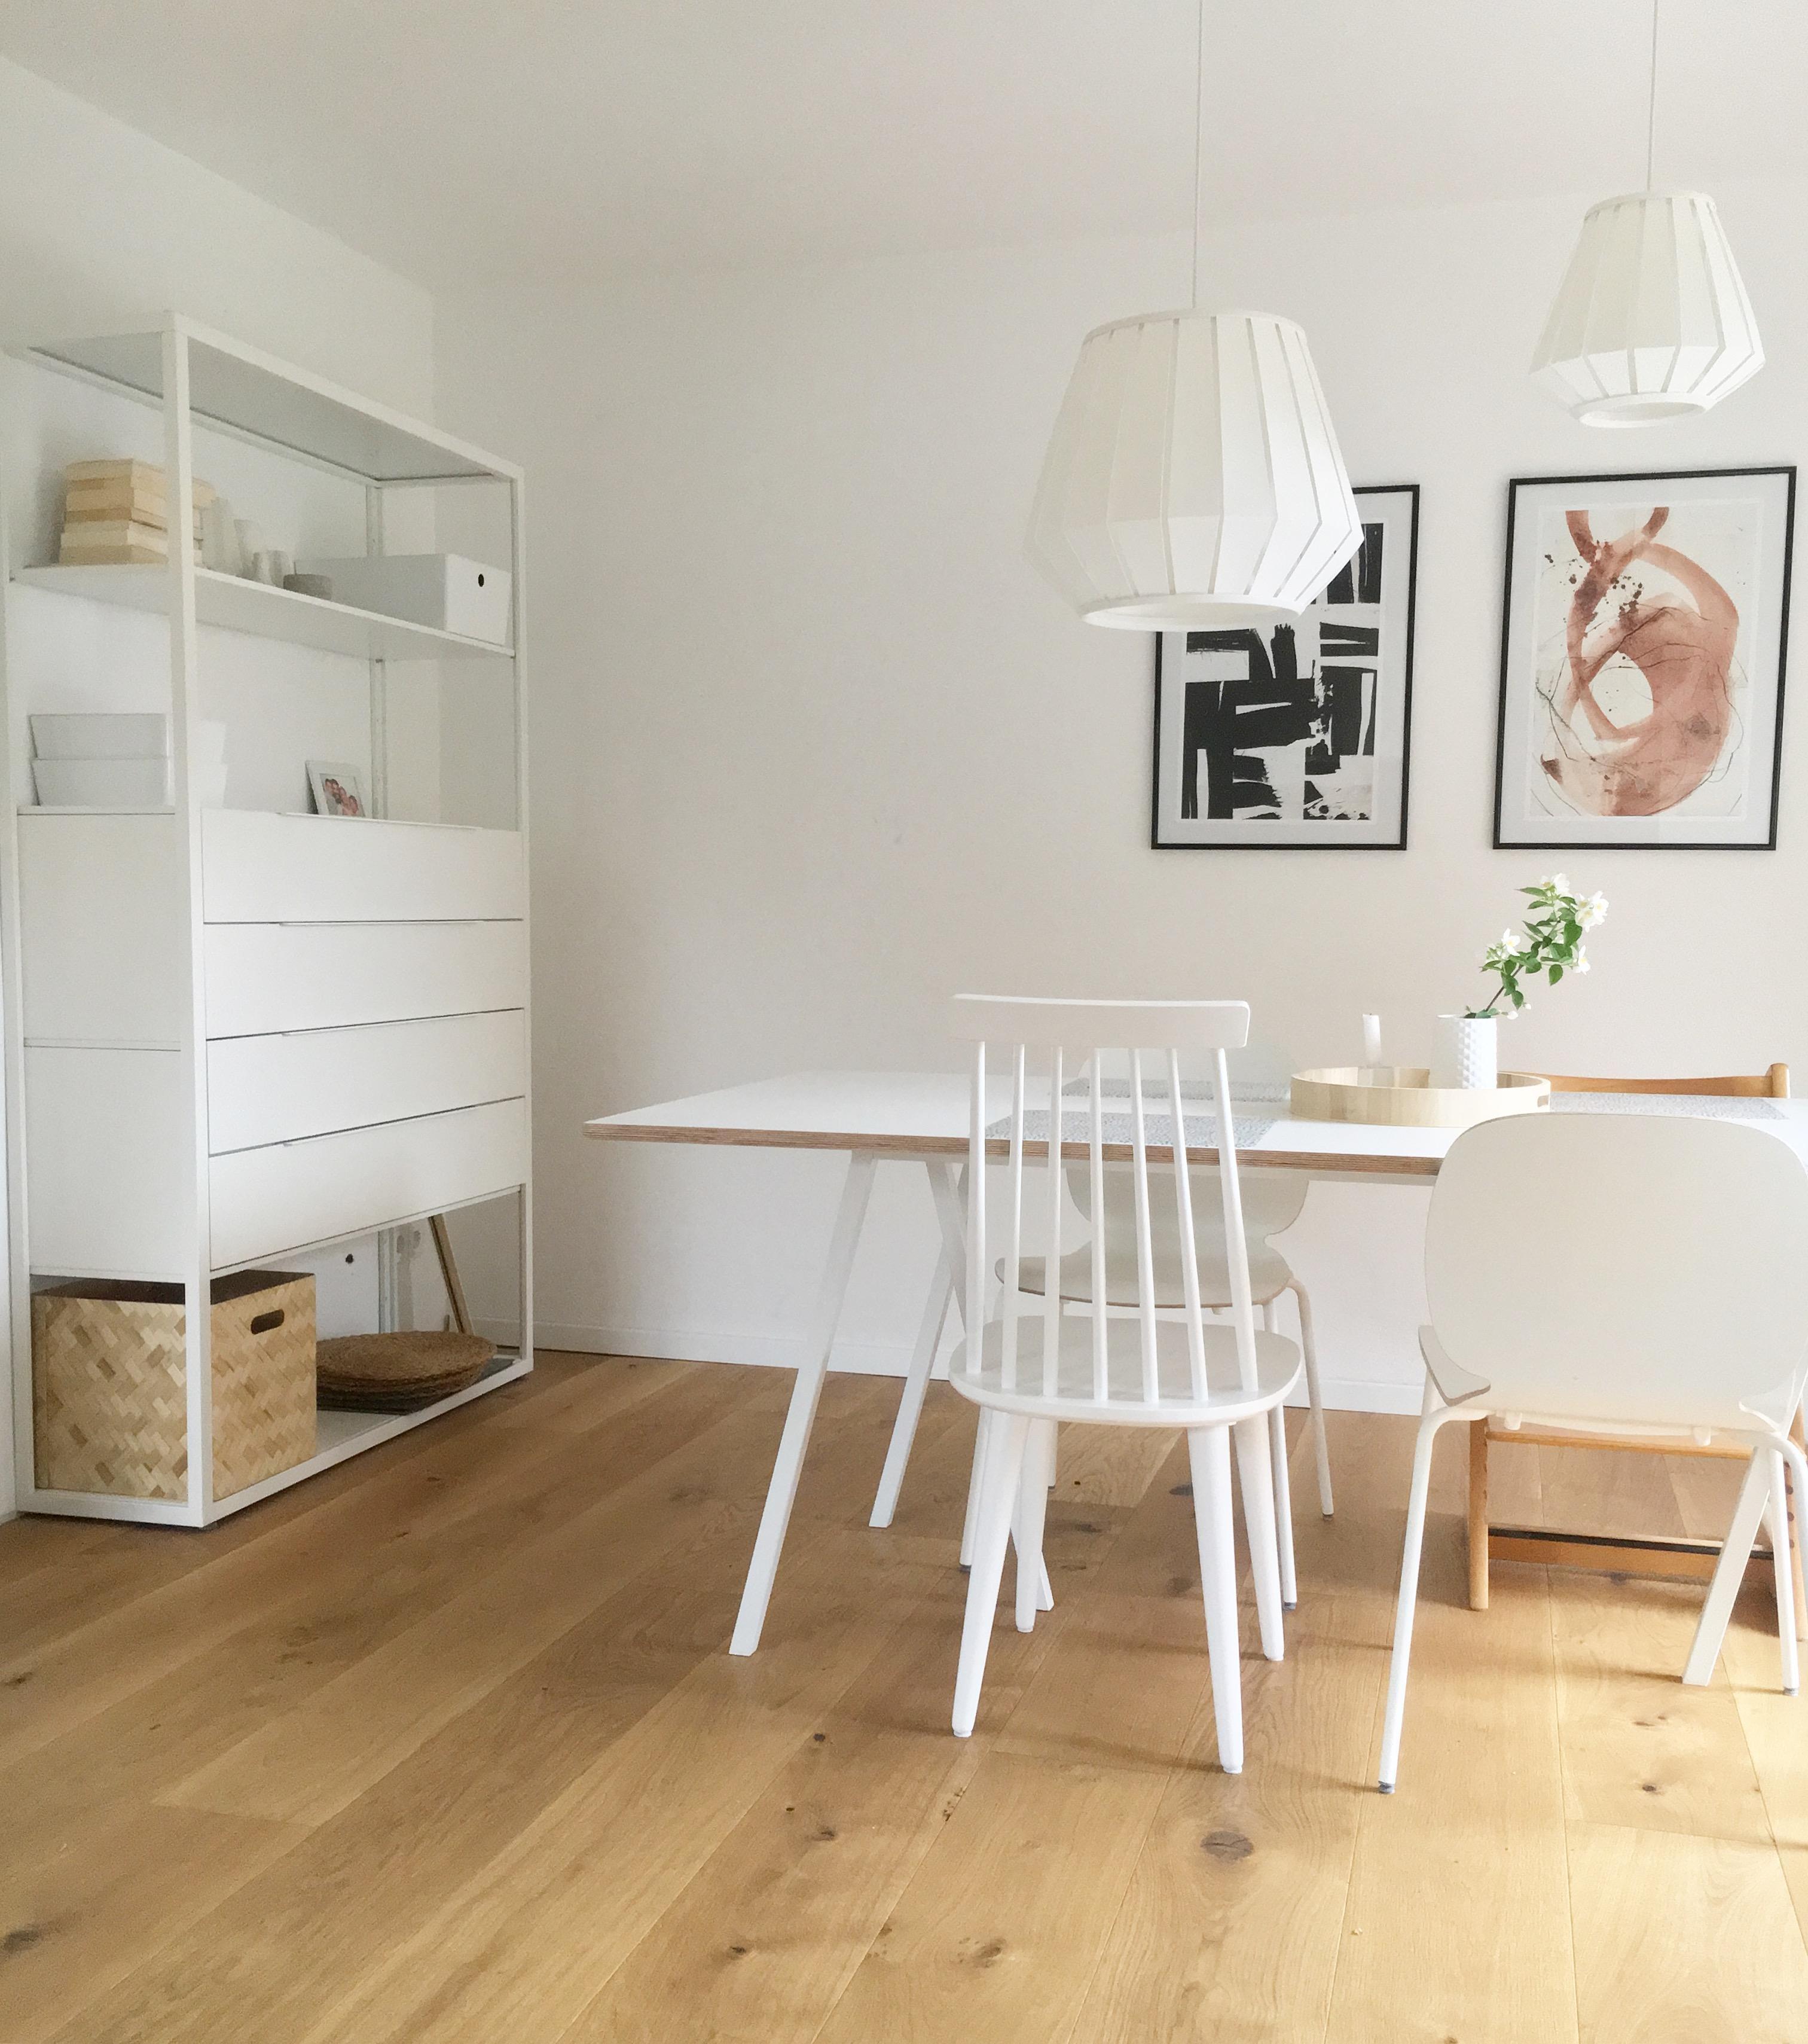 esszimmer lampen ikea good ikea luminaire frais ikea genial esszimmer glastisch ikea genial. Black Bedroom Furniture Sets. Home Design Ideas